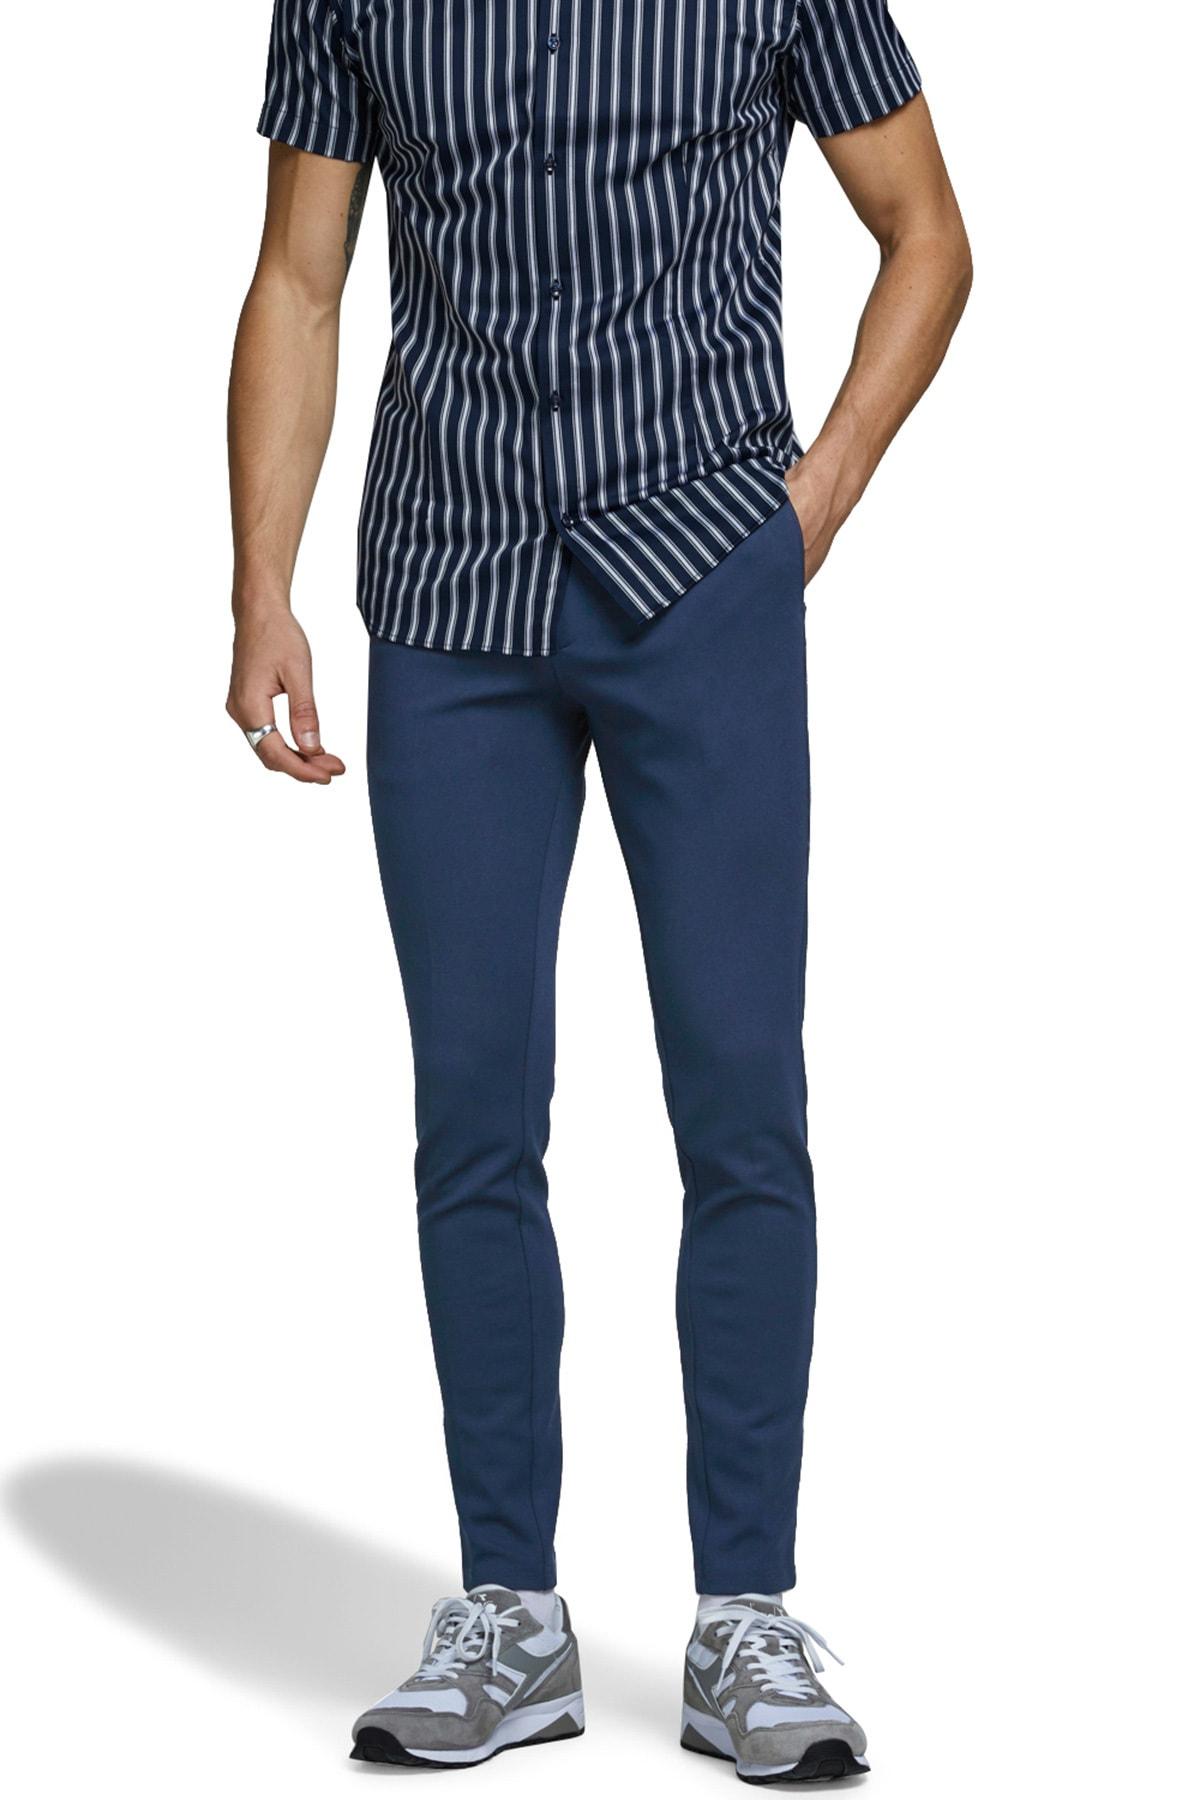 Jack & Jones Jeans Intelligence Jjımarco Slim Fit Pantolon ERKEK PANTOLON 12173630 2